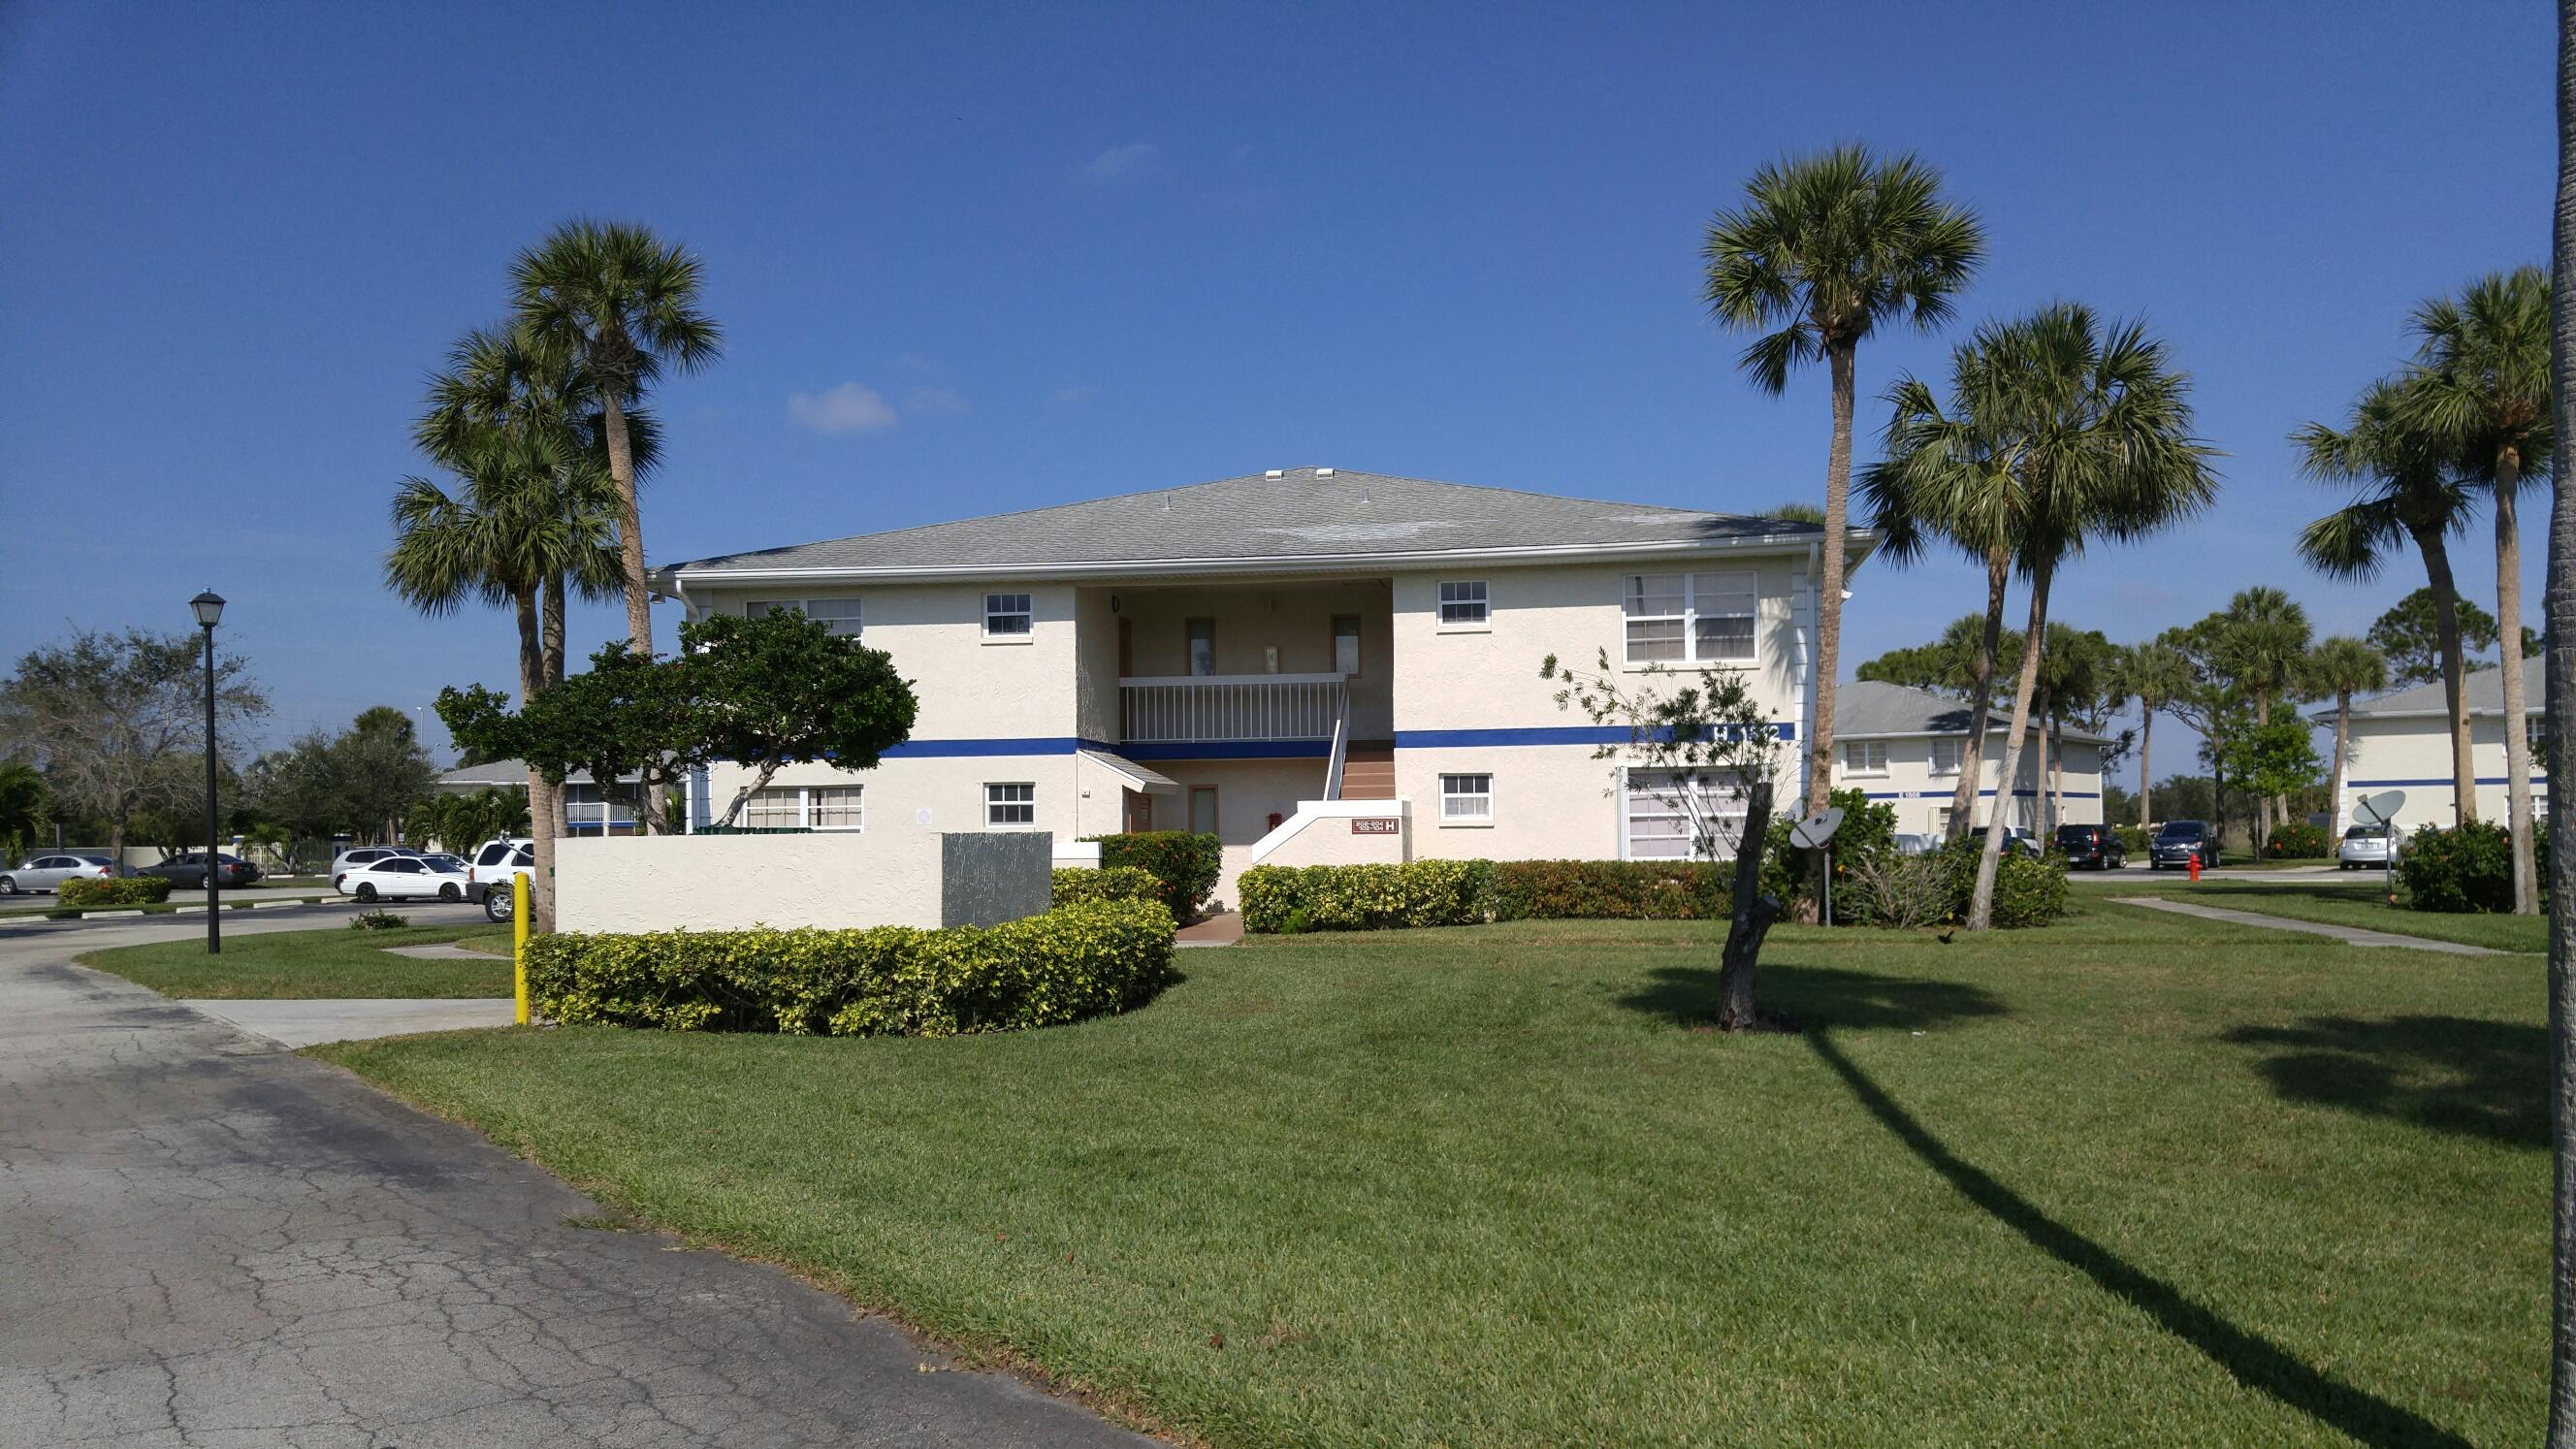 1508 Royal Green Circle, Port Saint Lucie, Florida 34952, 2 Bedrooms Bedrooms, ,2 BathroomsBathrooms,Condo/Coop,For Sale,Royal Green,2,RX-10465398